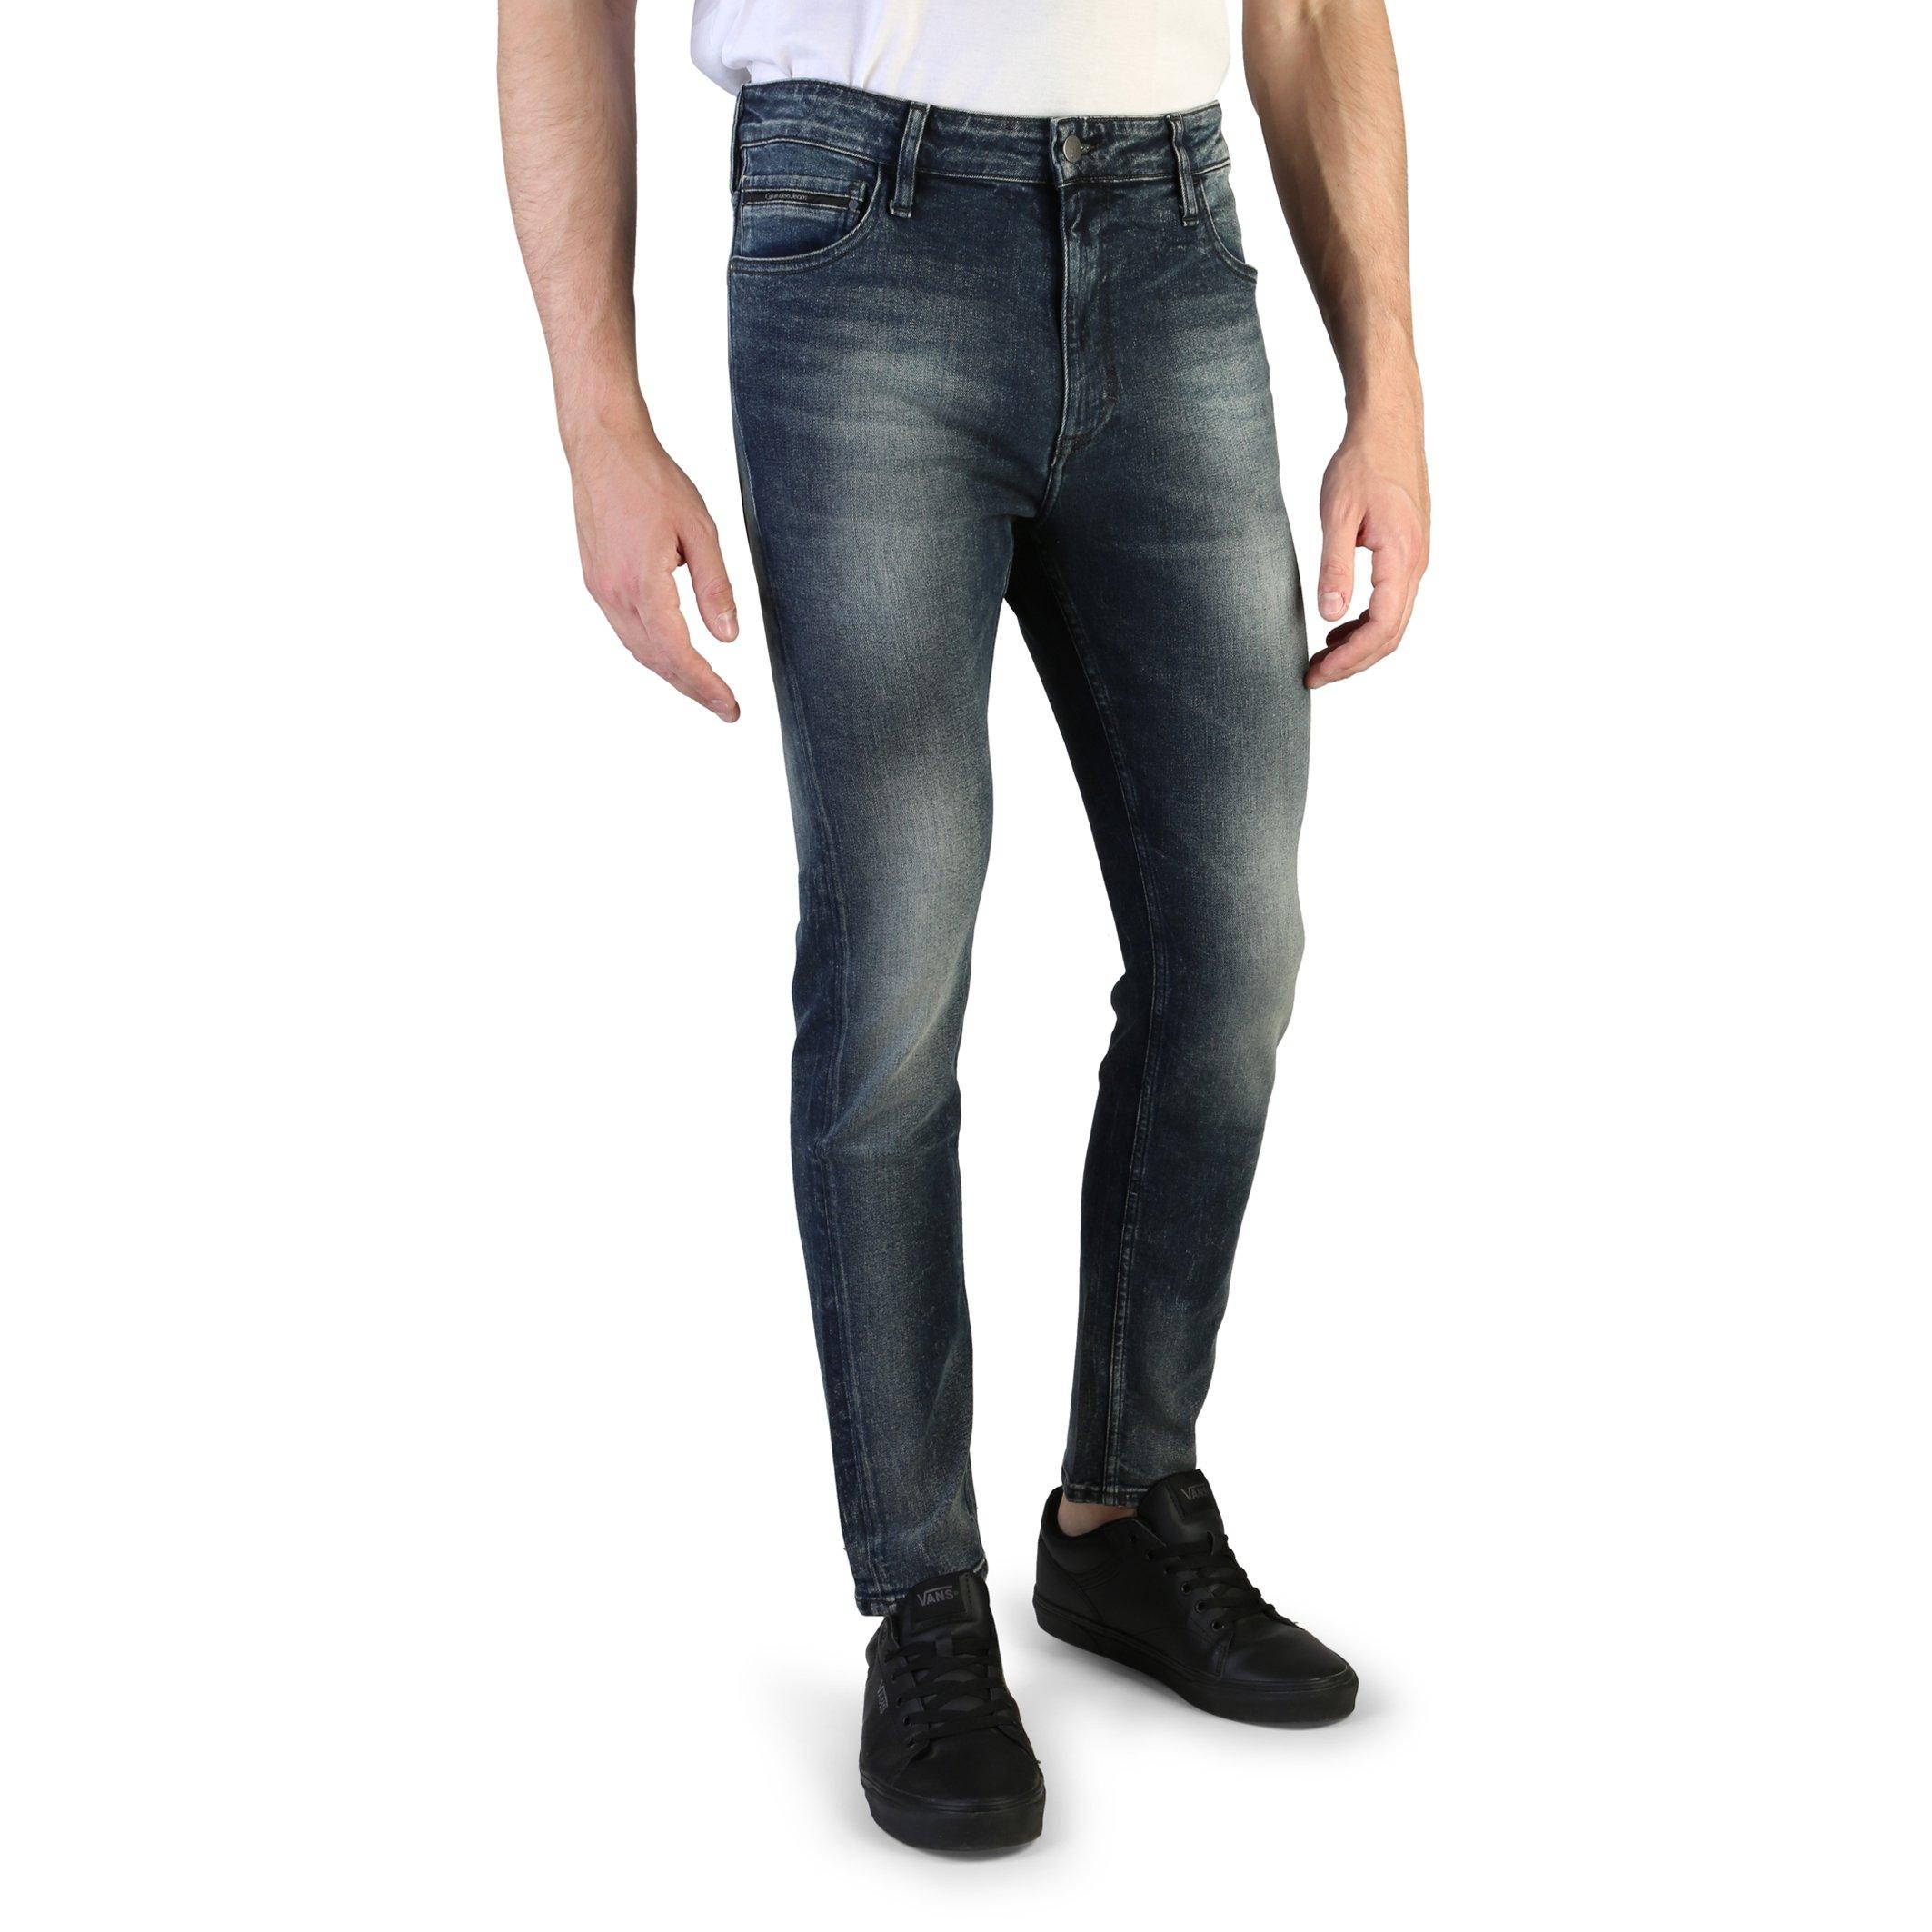 Calvin Klein Men's Jeans Blue J30J305740 - blue-1 30